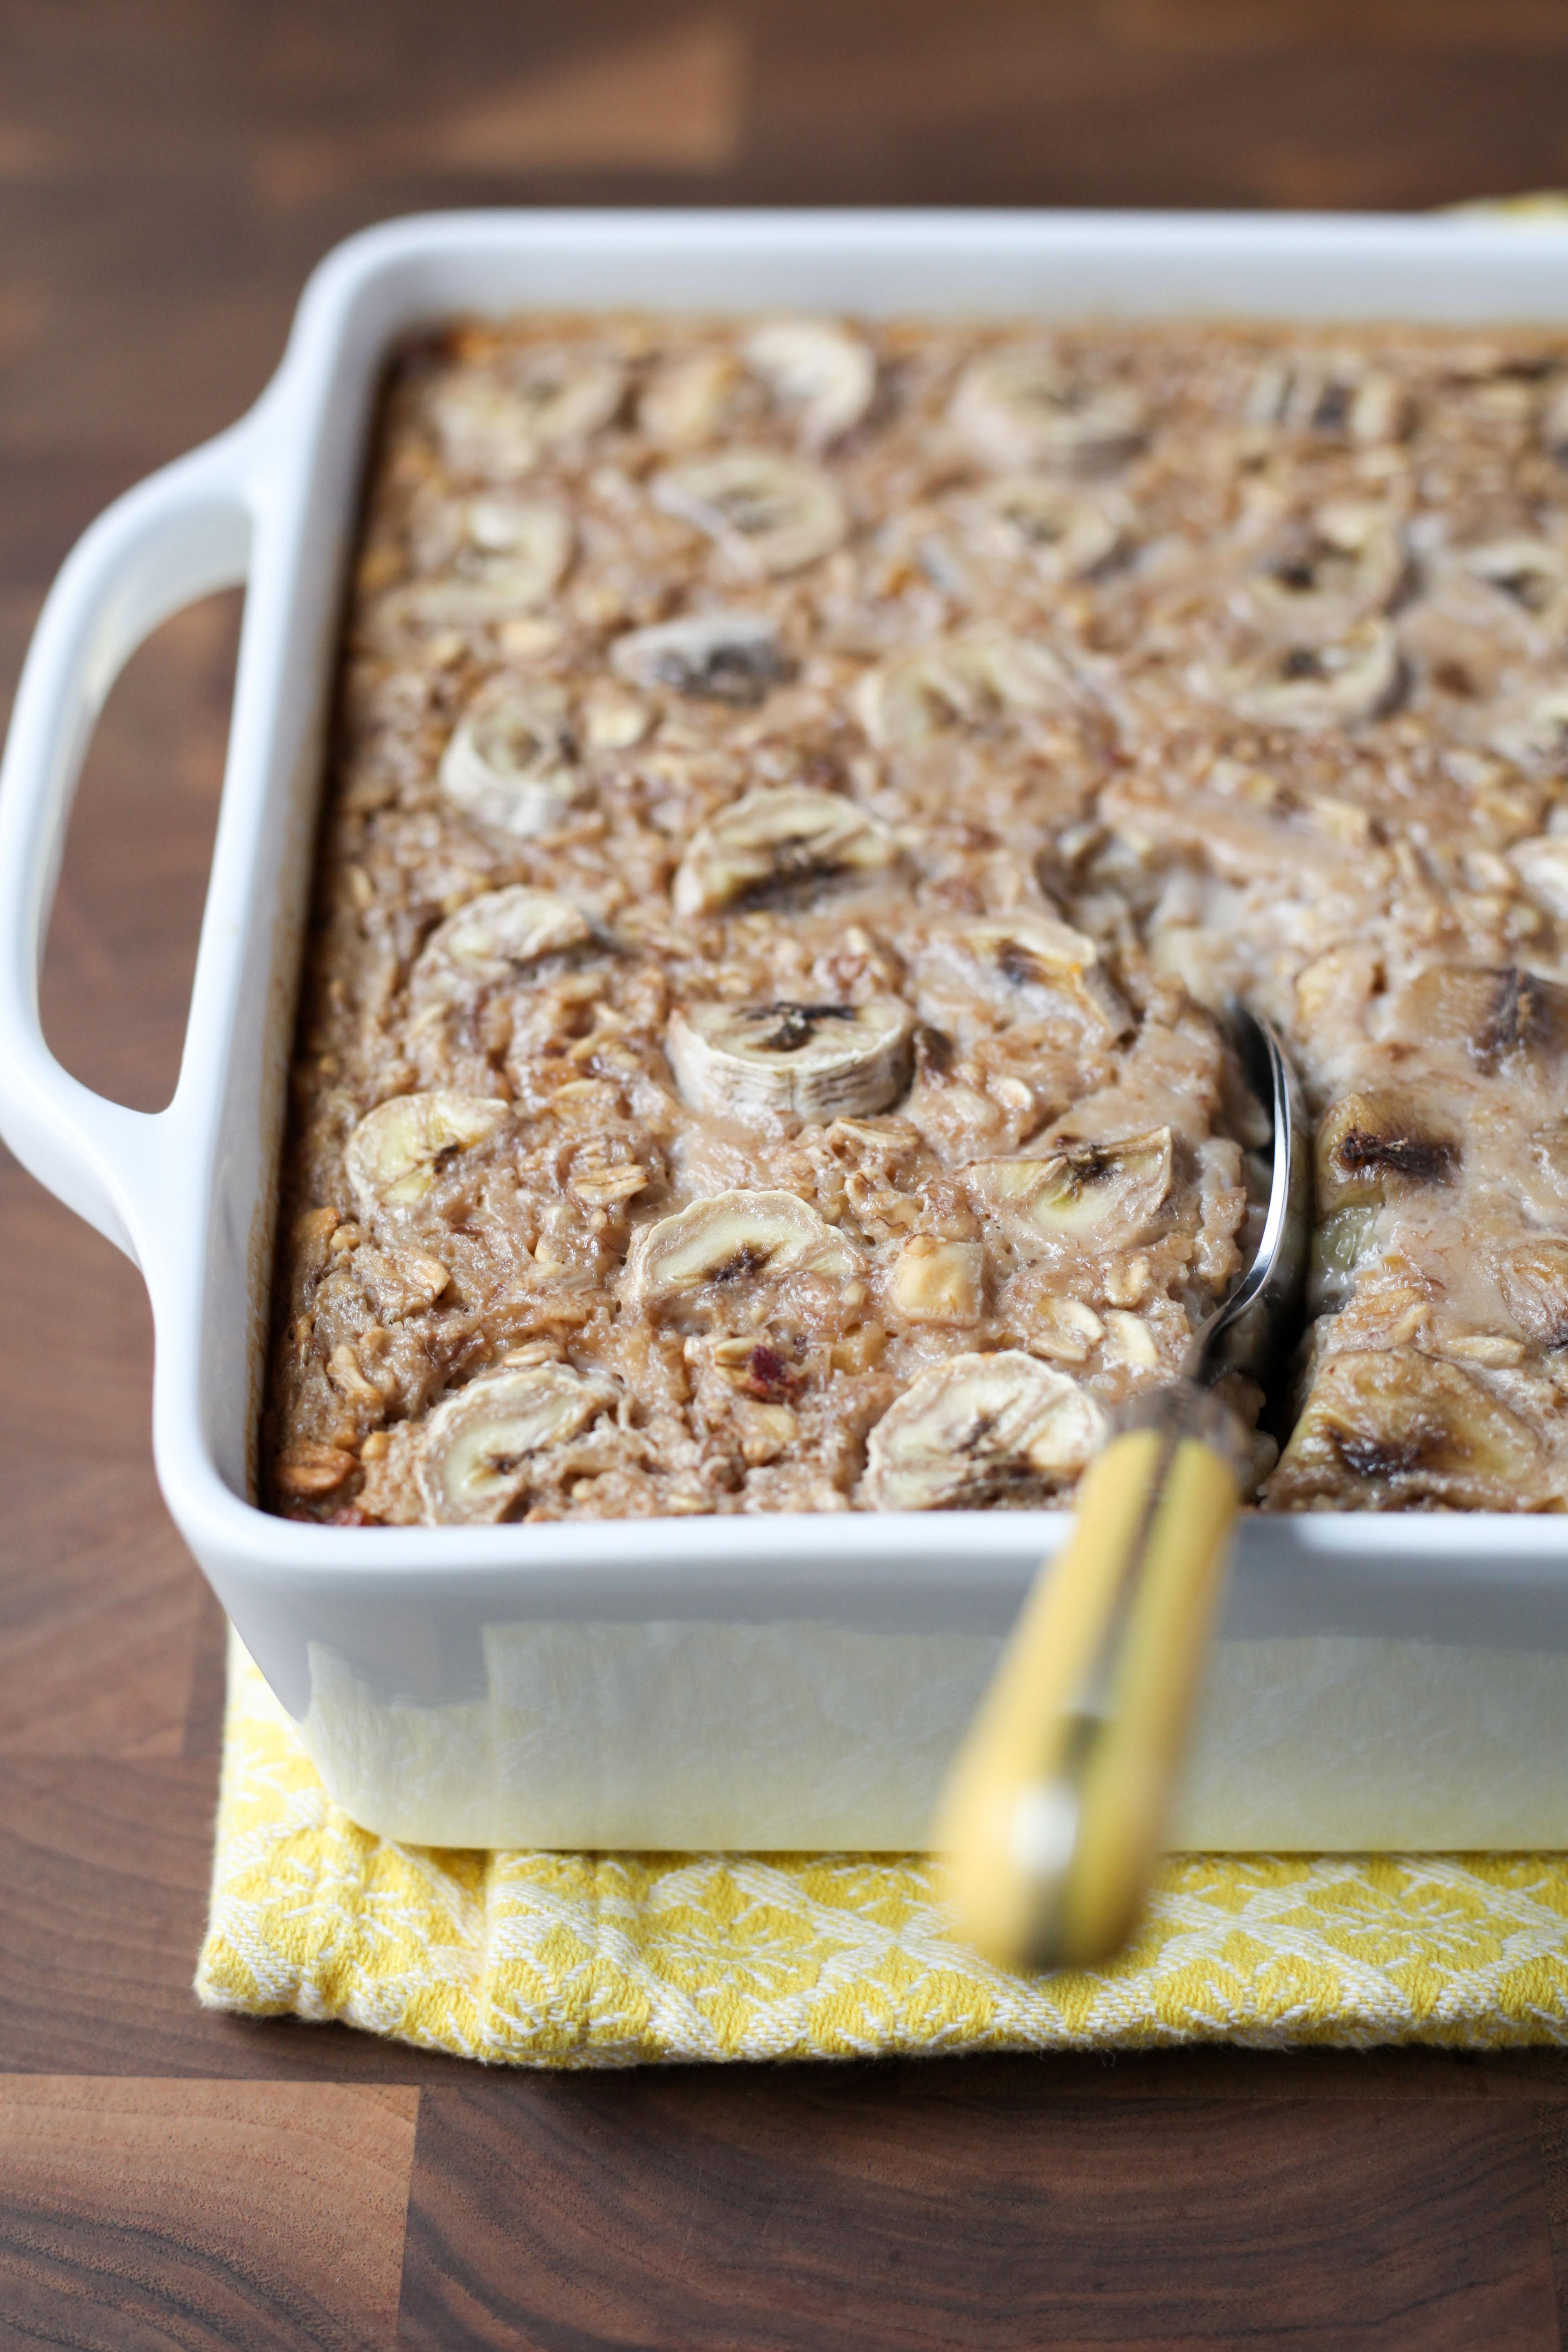 Banana Bread Baked Oatmeal | amodestfeast.com | @amodestfeast